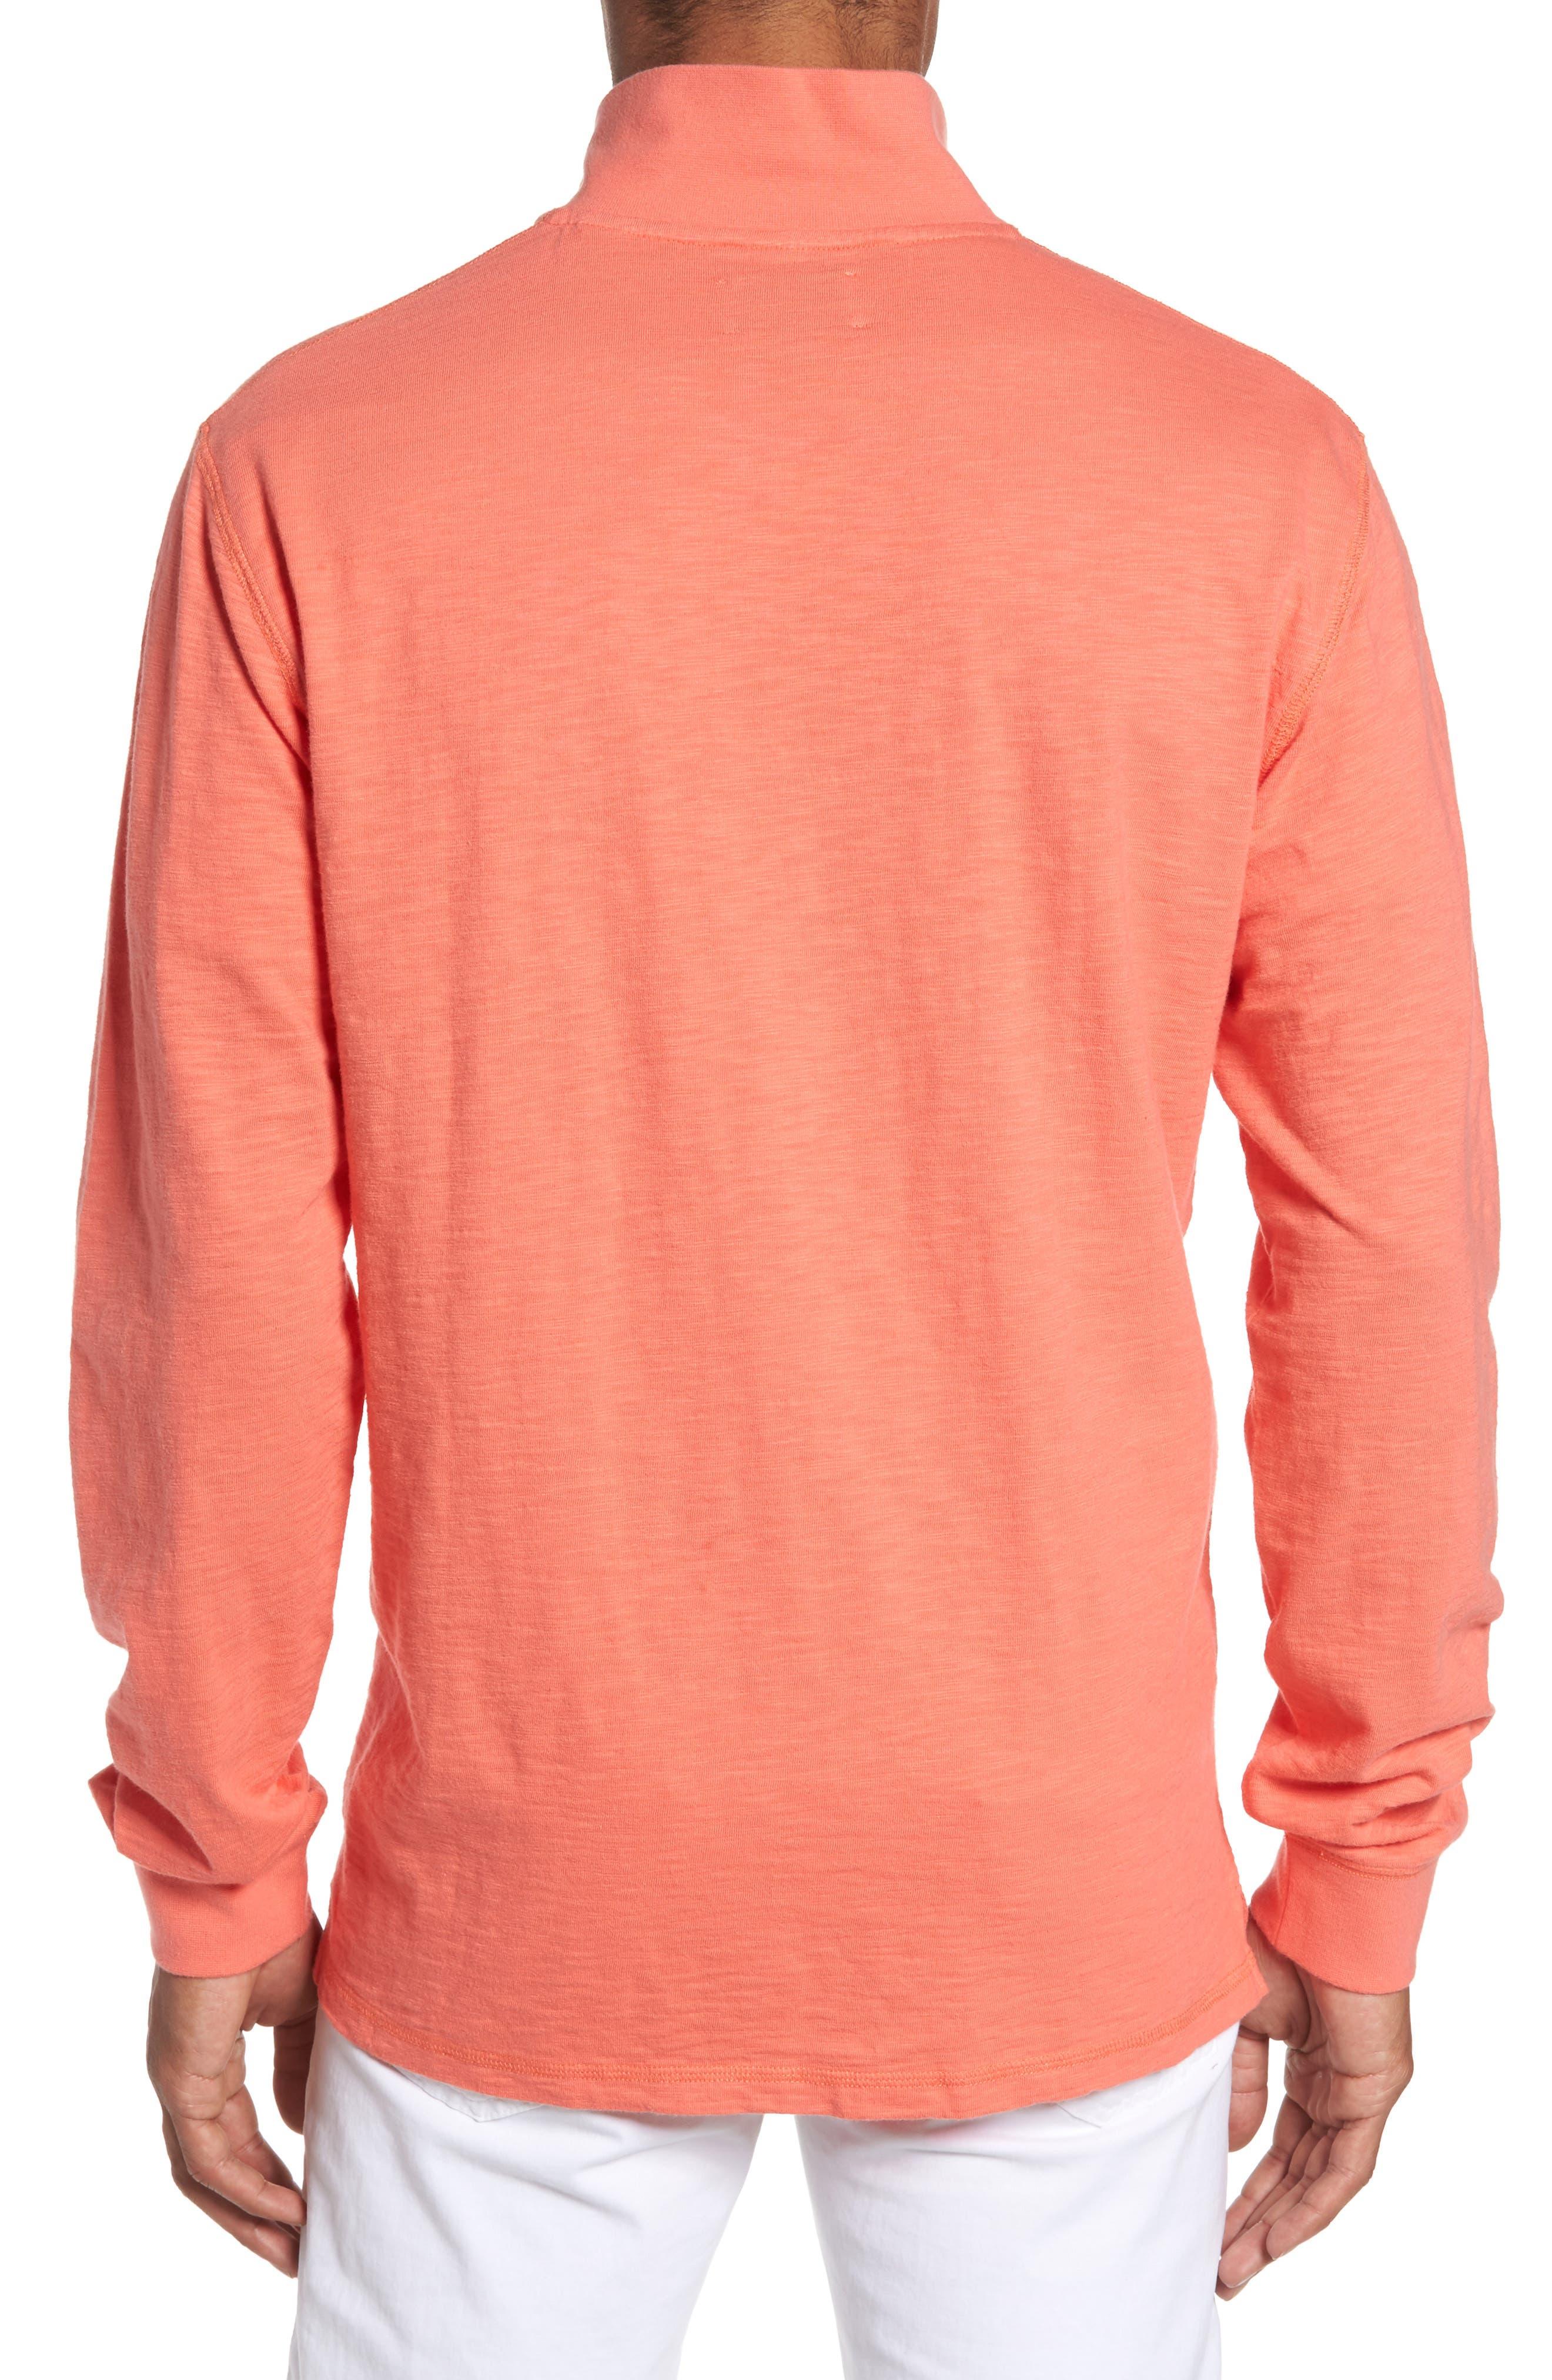 Gulf Stream Sweatshirt,                             Alternate thumbnail 2, color,                             Melon